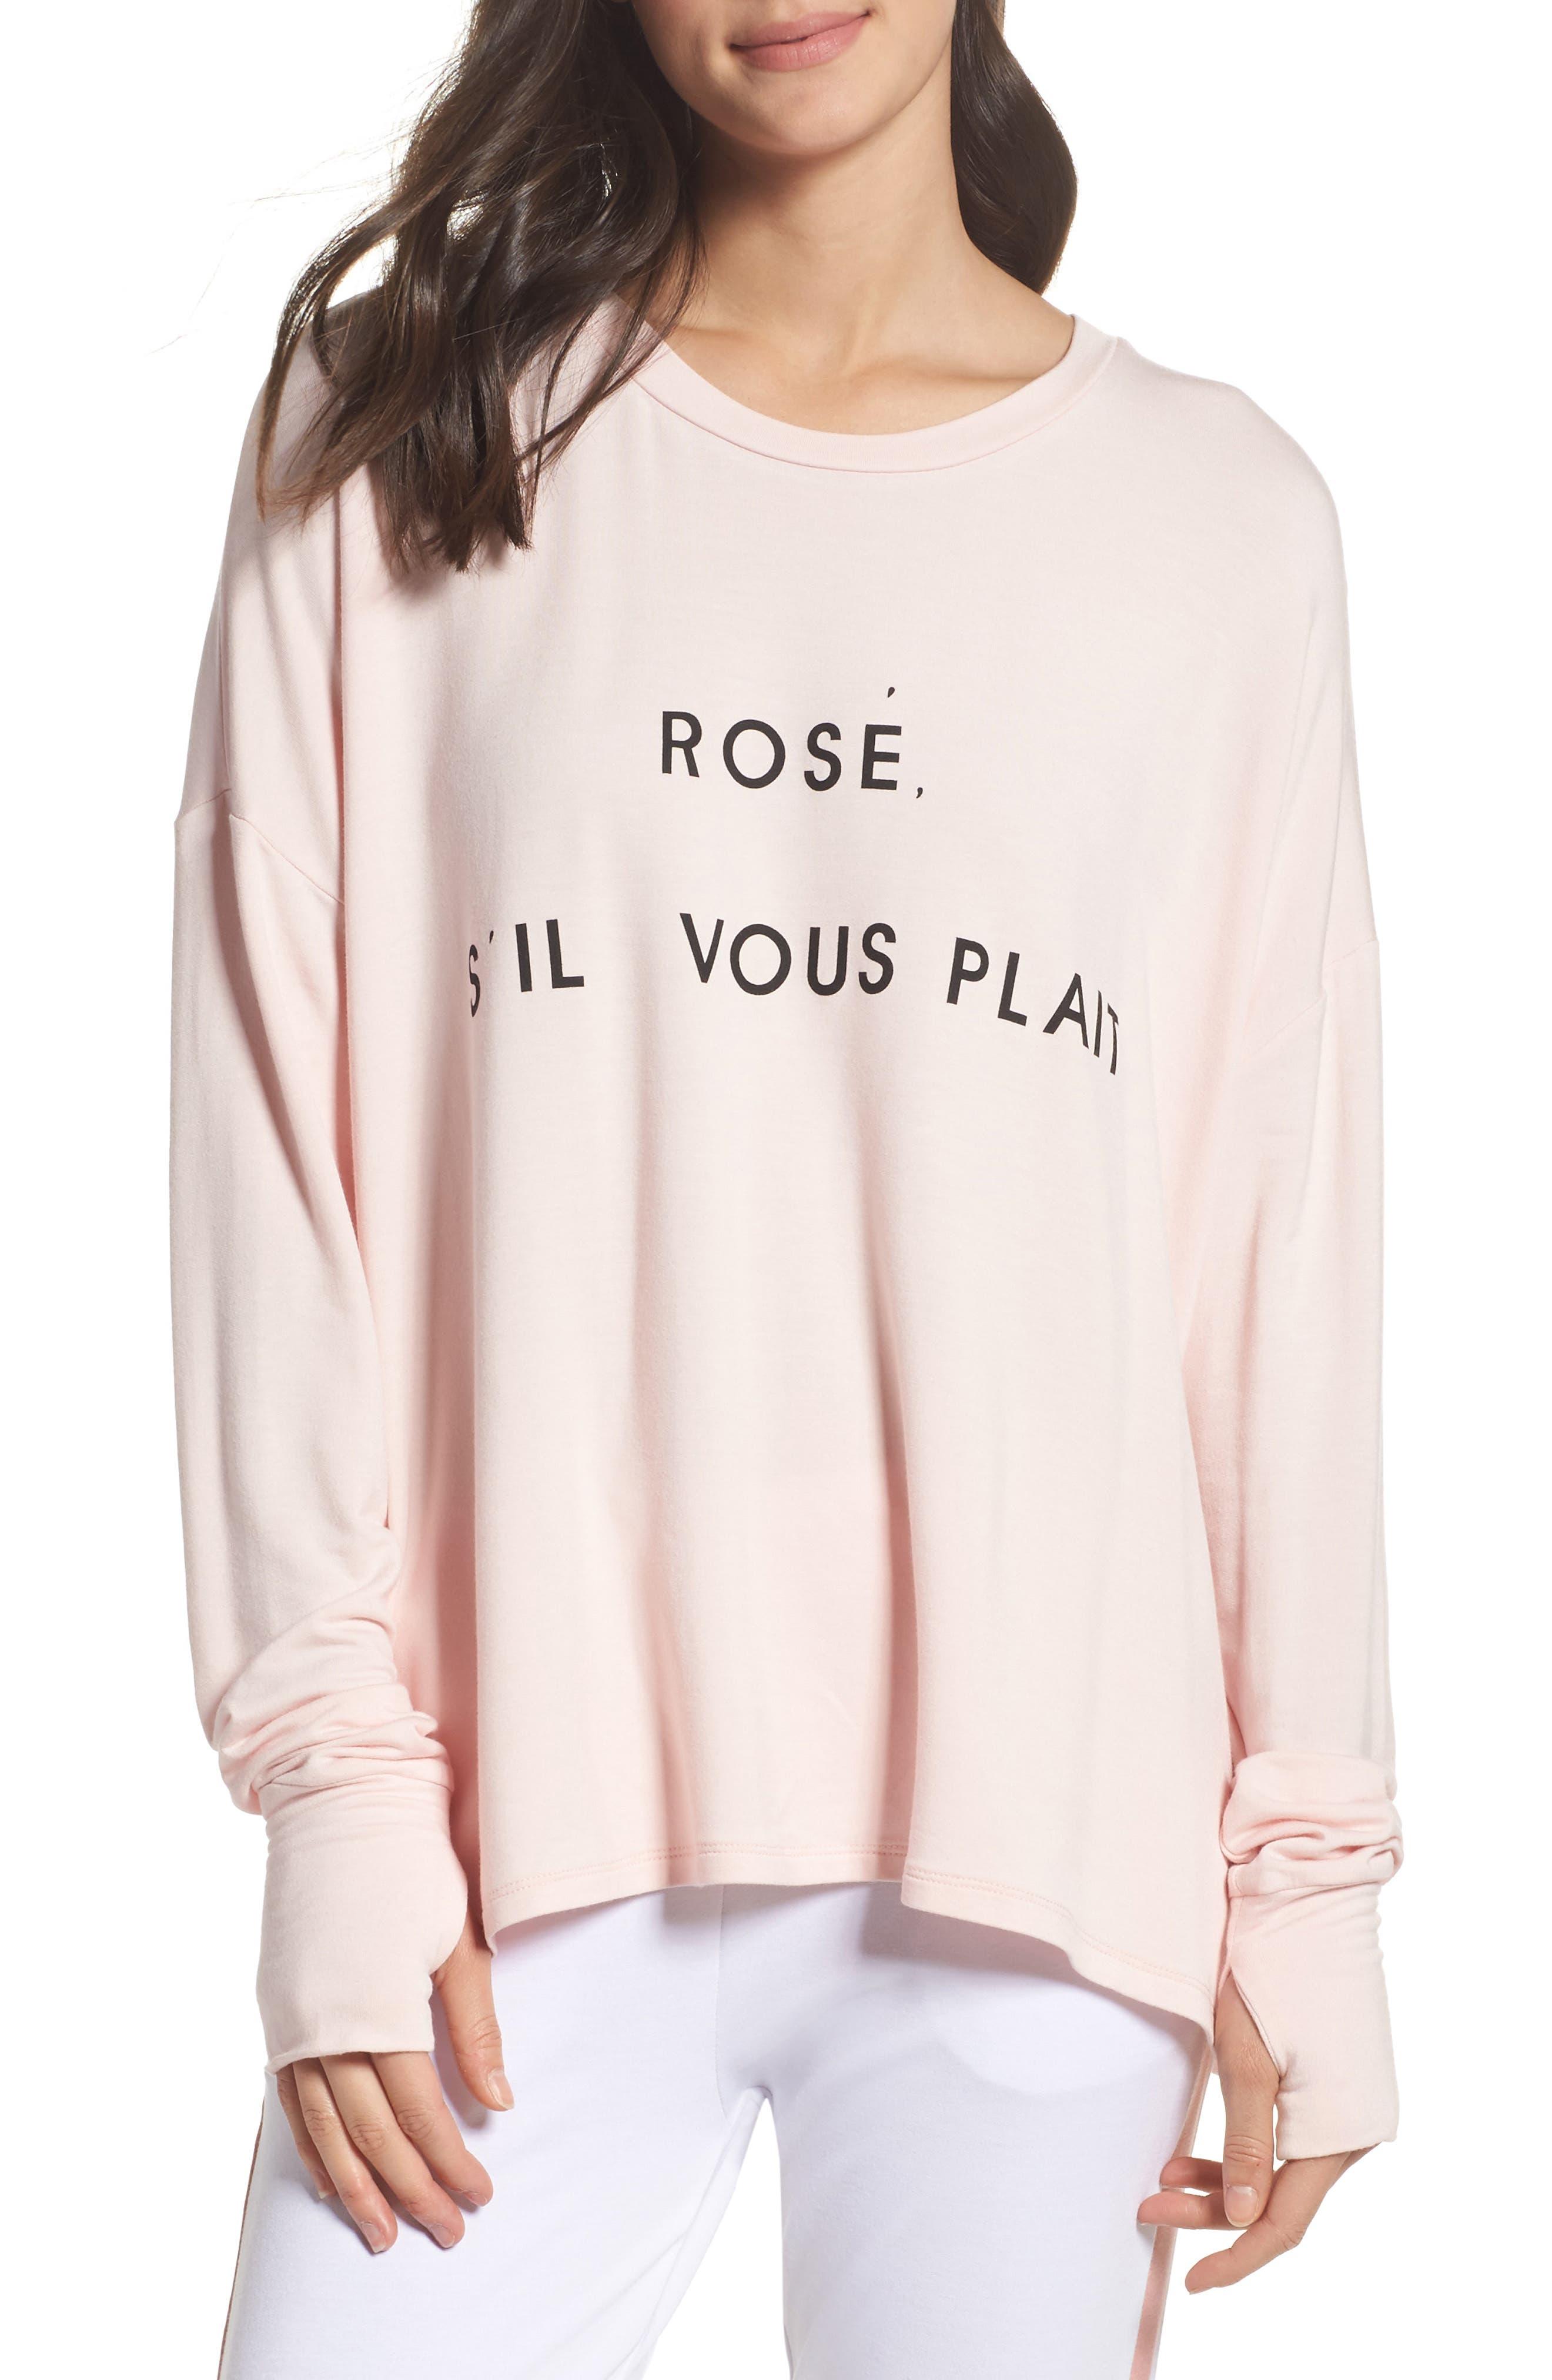 Rosé Please Sweatshirt,                         Main,                         color,